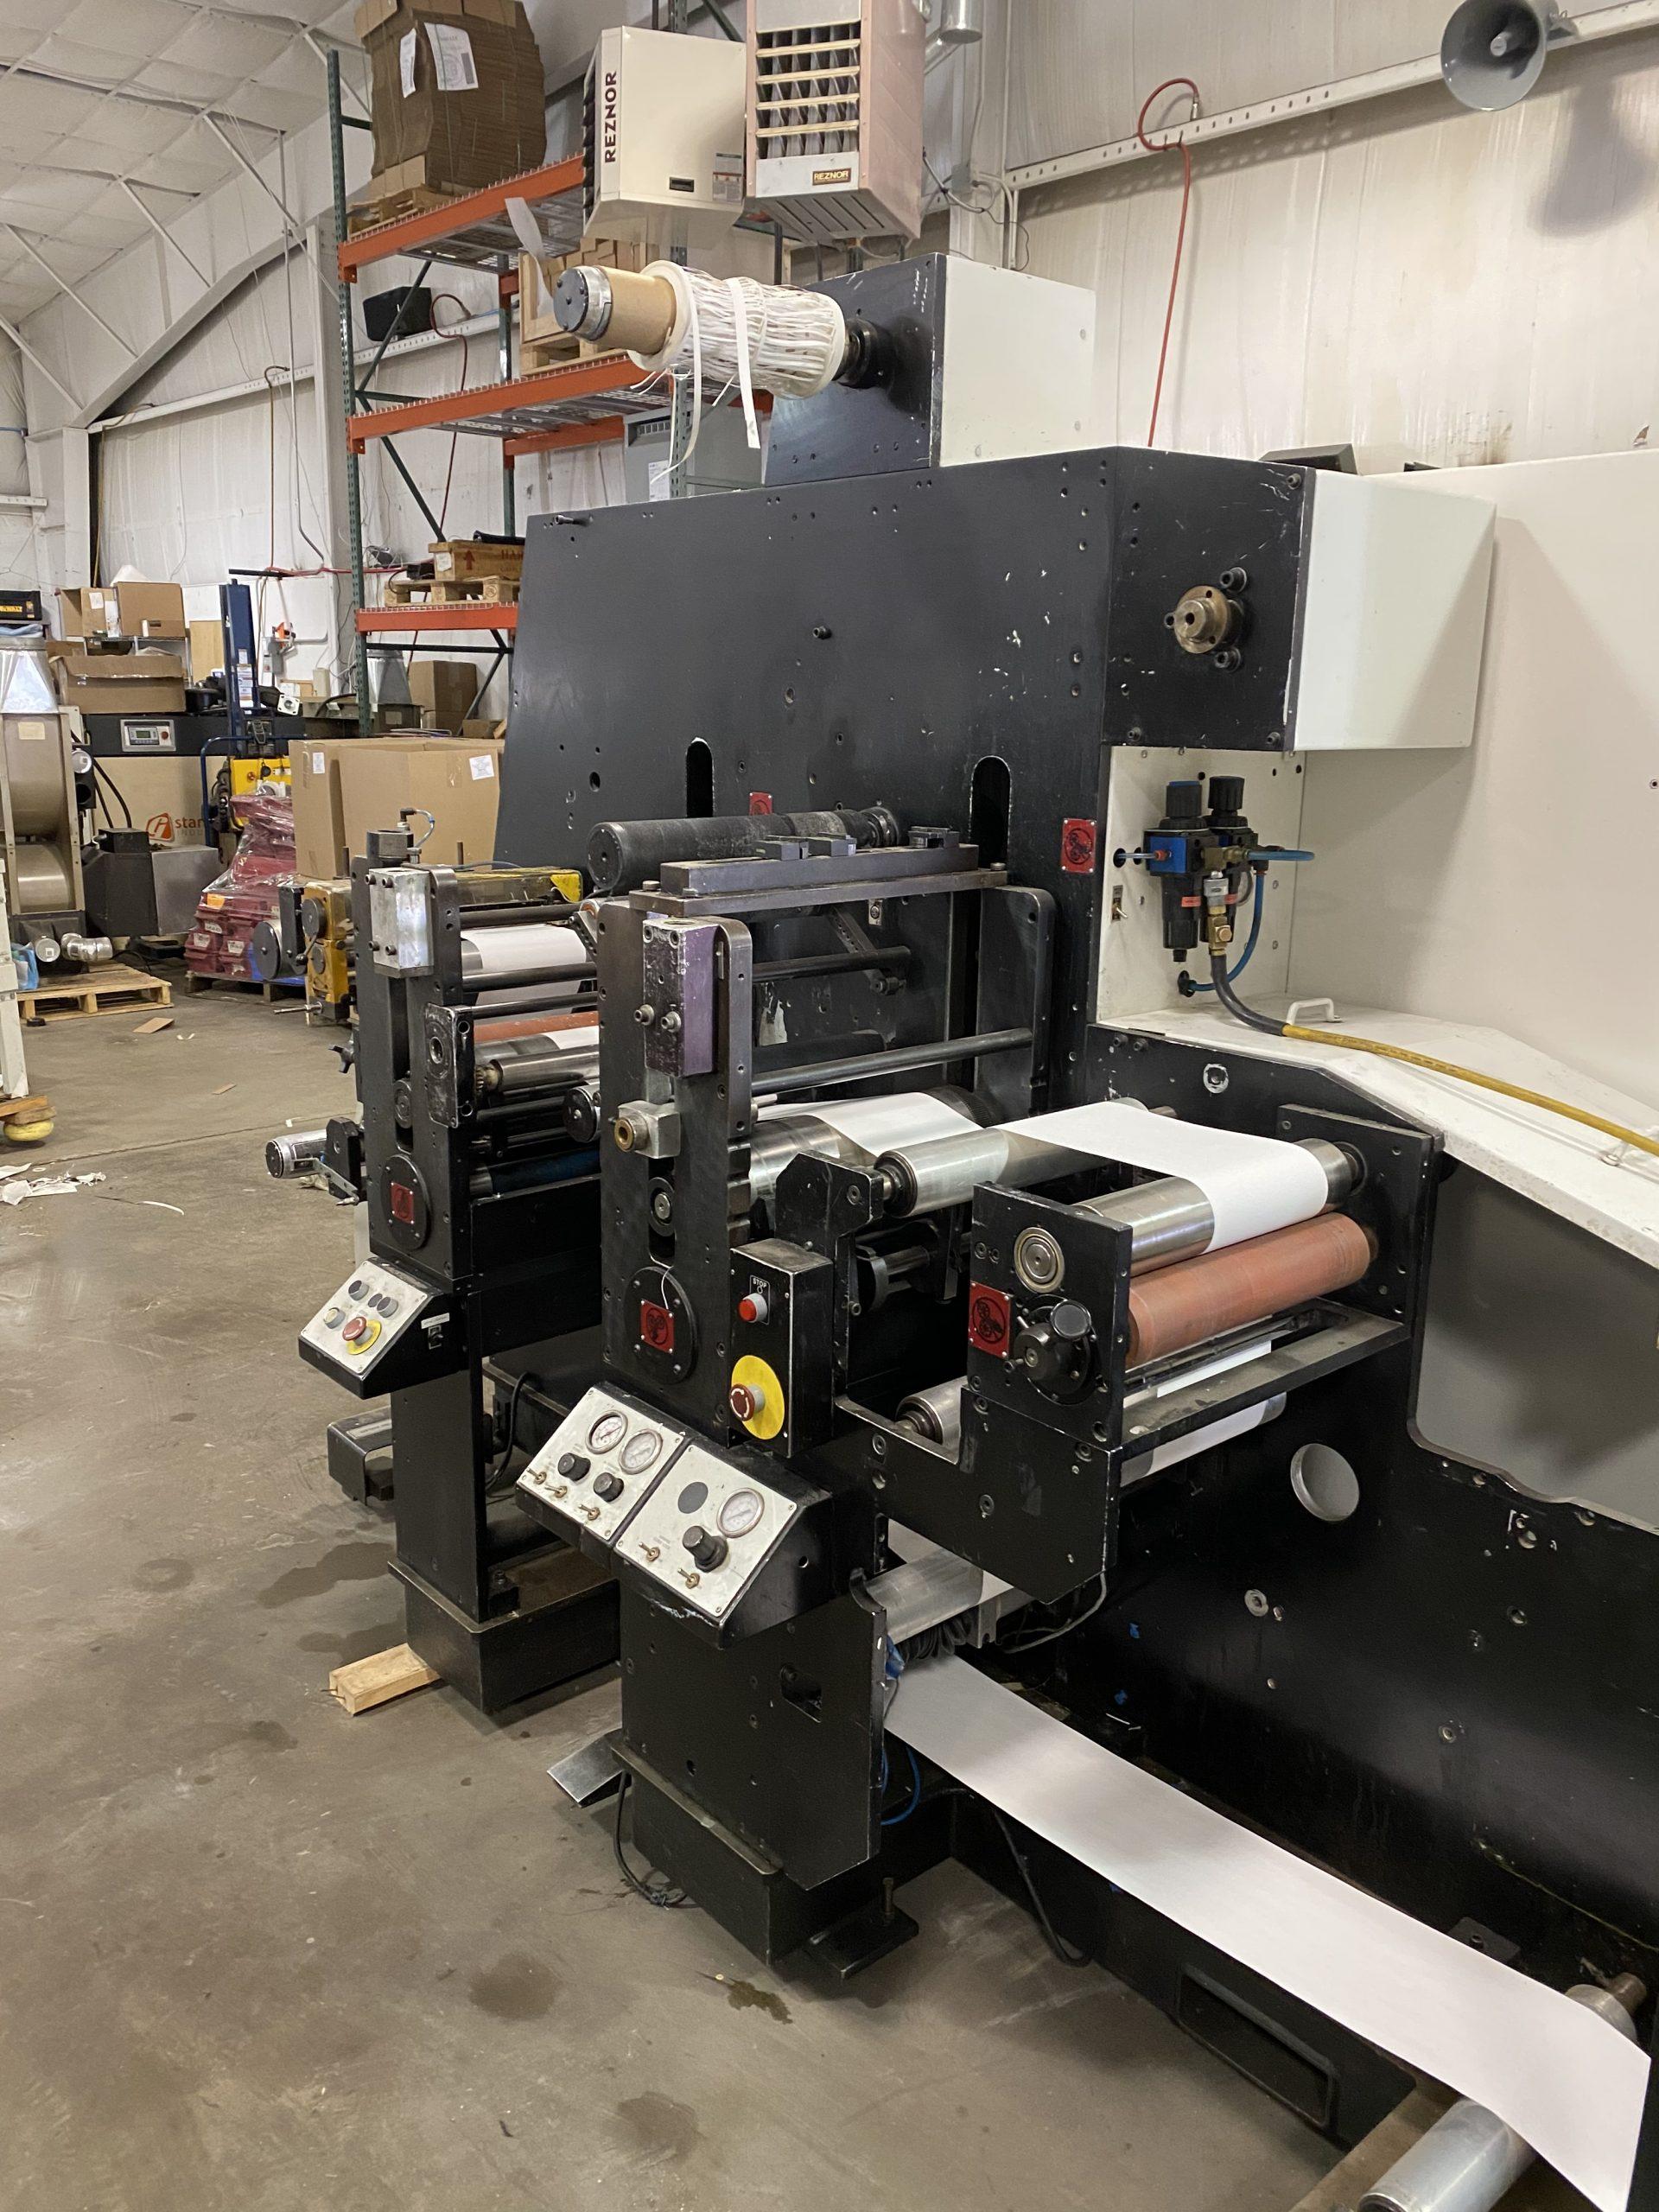 Rotoflex DLI330 - Used Flexo Printing Presses and Used Flexographic Equipment-13